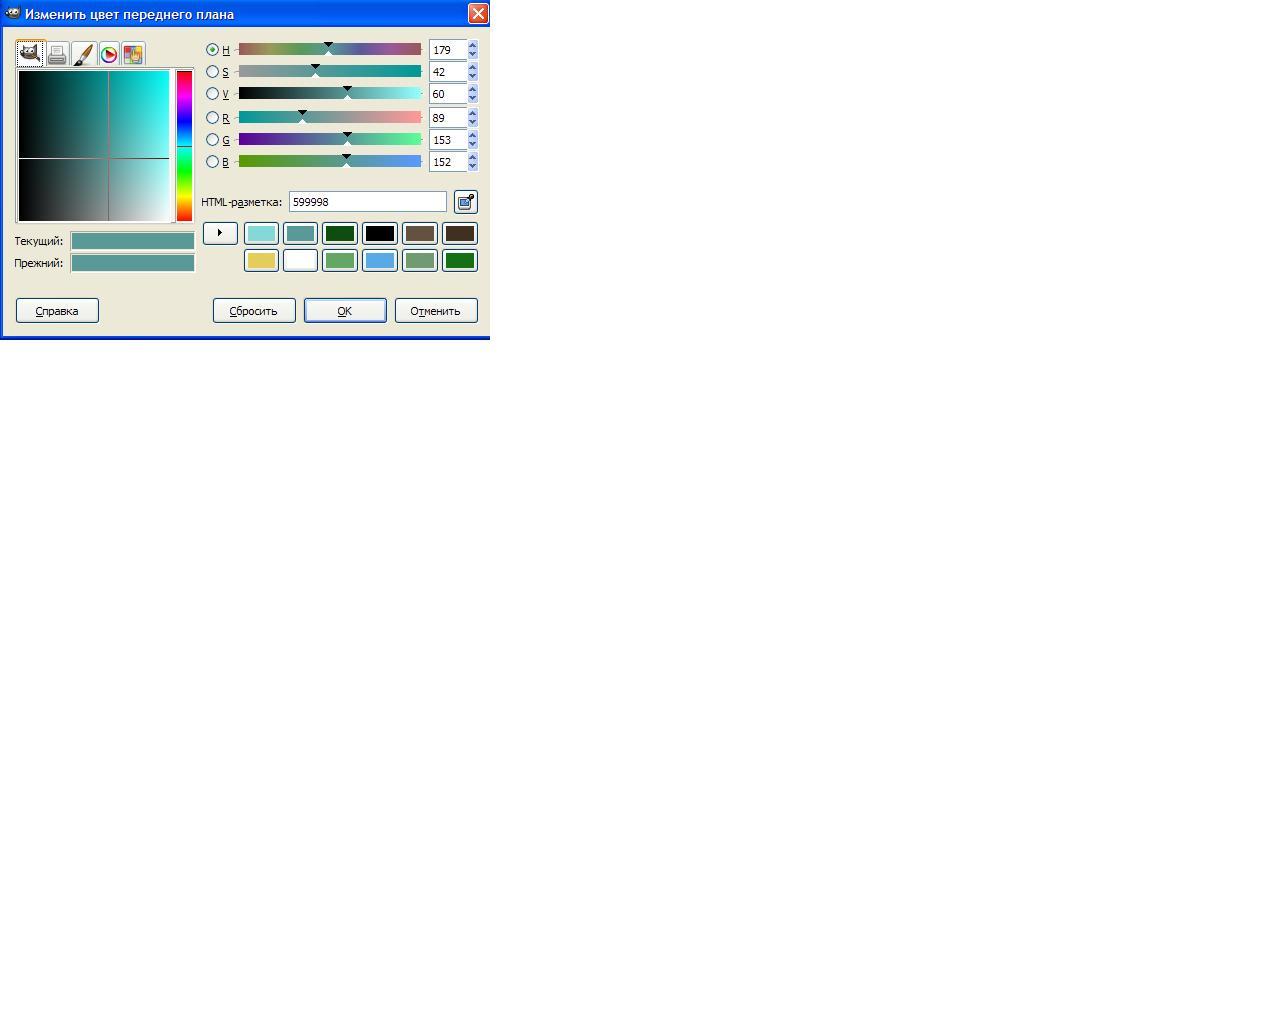 hello_html_7d37800.jpg